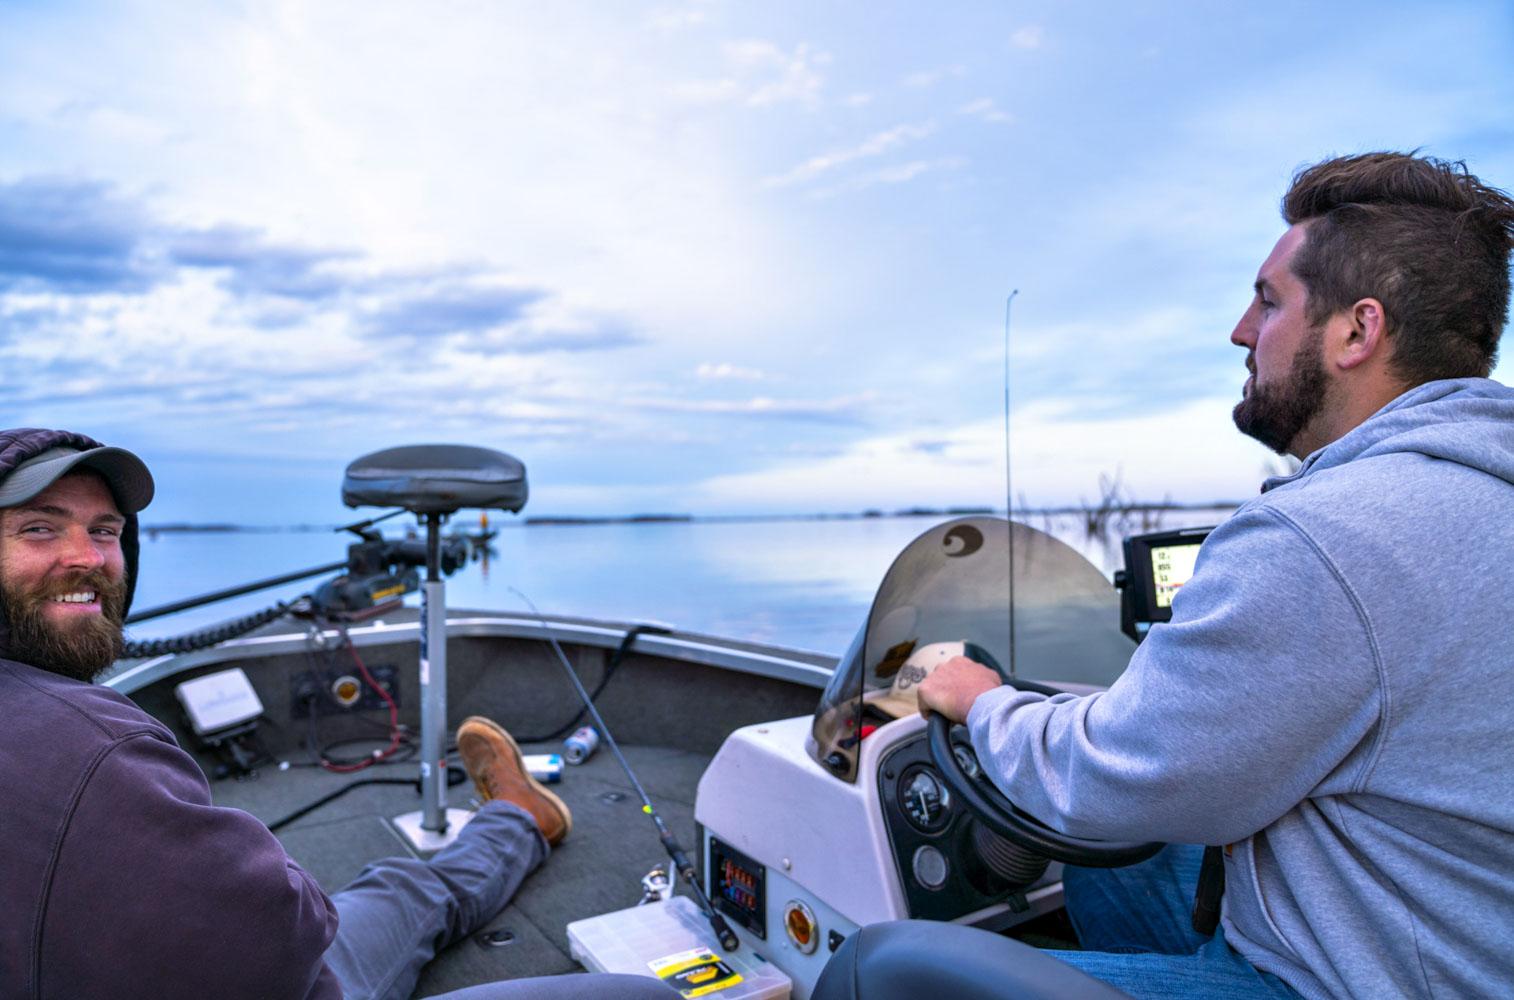 ftf_Fishing and Boating